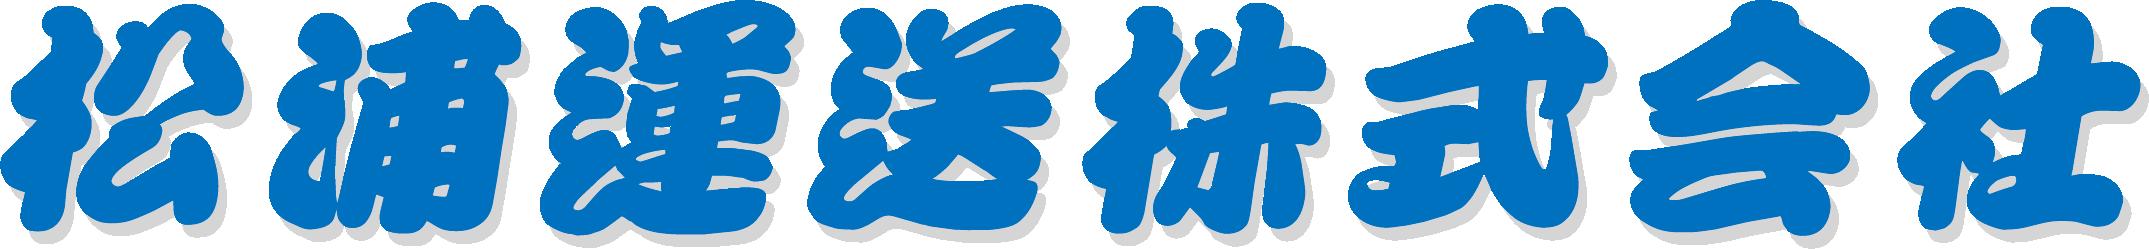 松浦運送株式会社 matsuura-unso